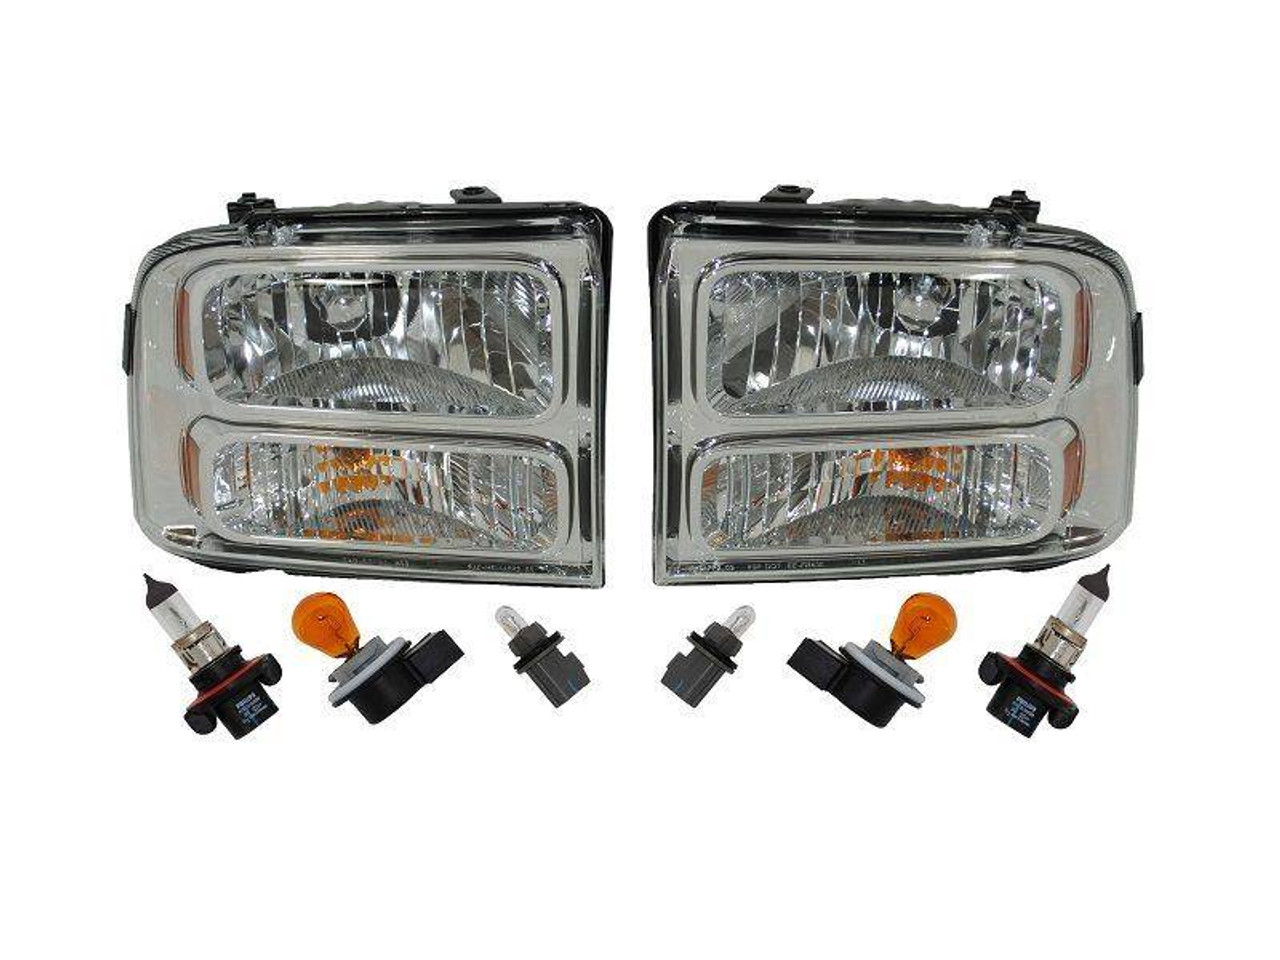 2005-2007 Ford Freestyle LH Drivers Side Headlight Headlamp OEM 38699